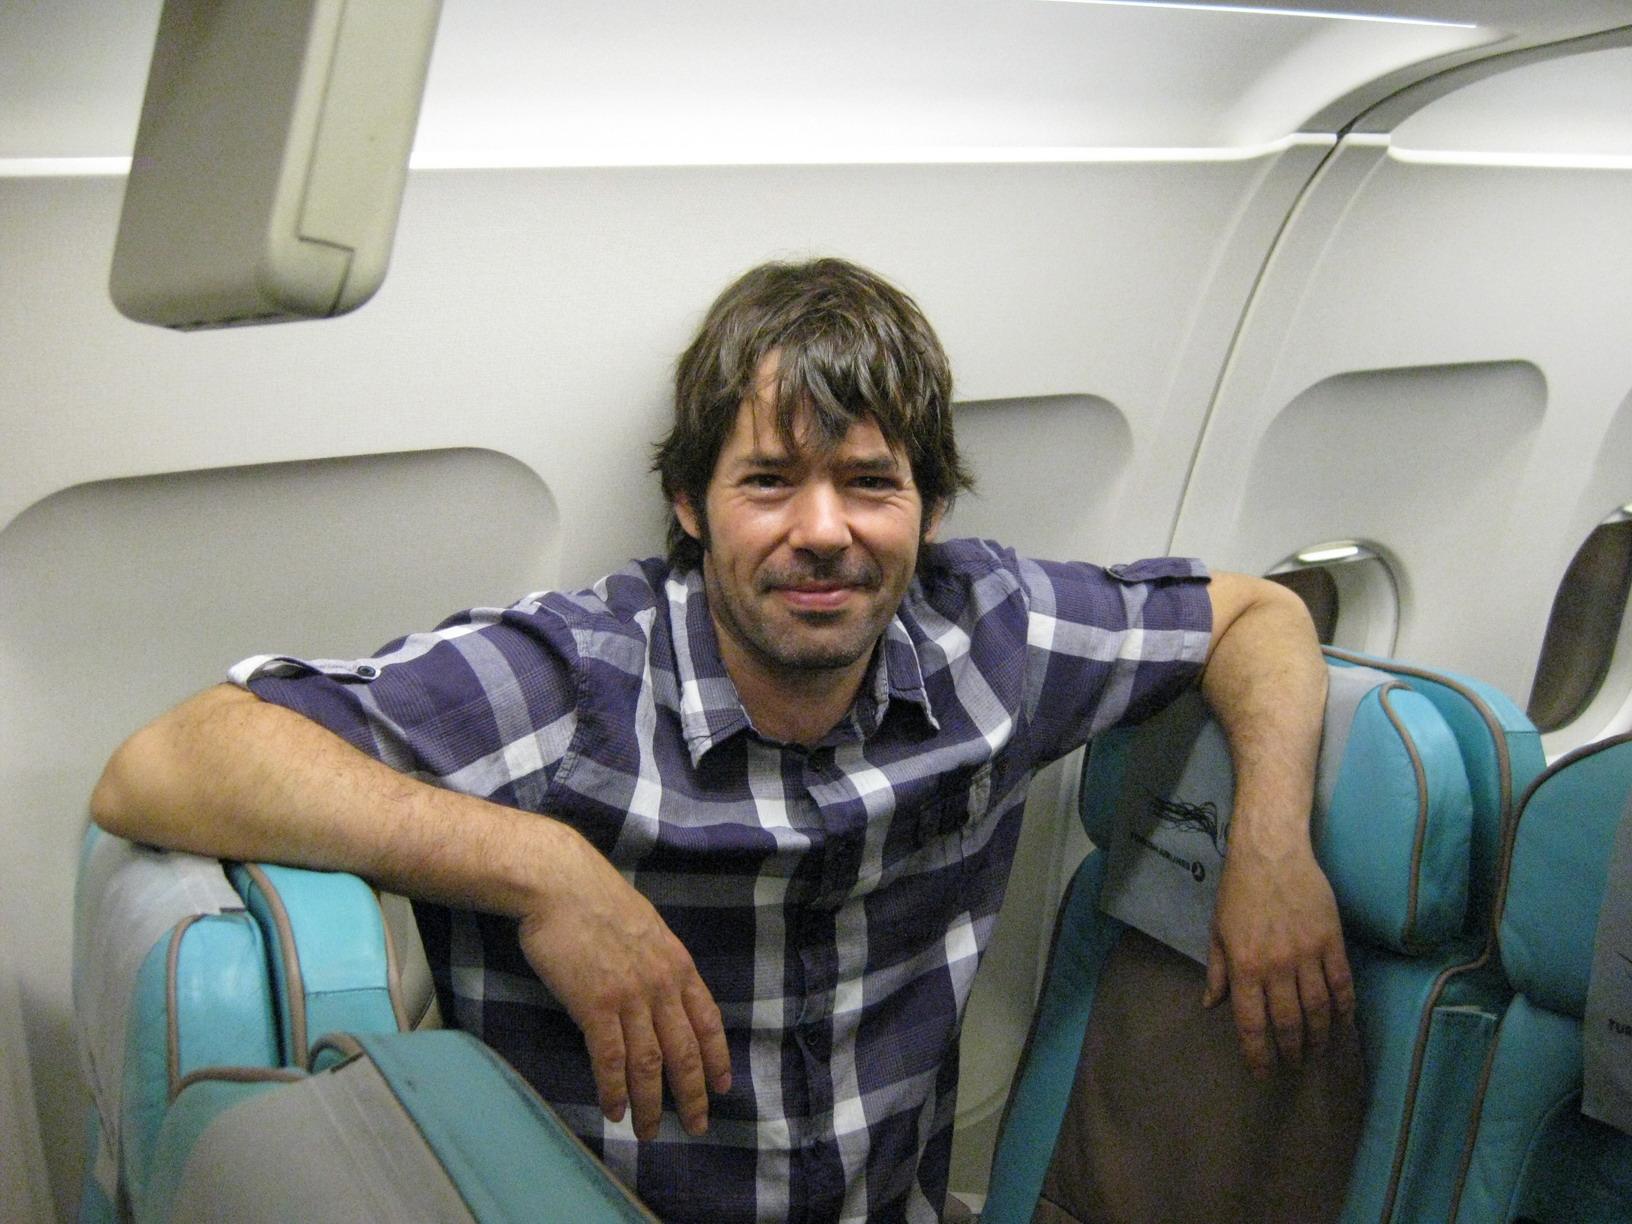 Daniel-Ruiz-viajares-avion_resize